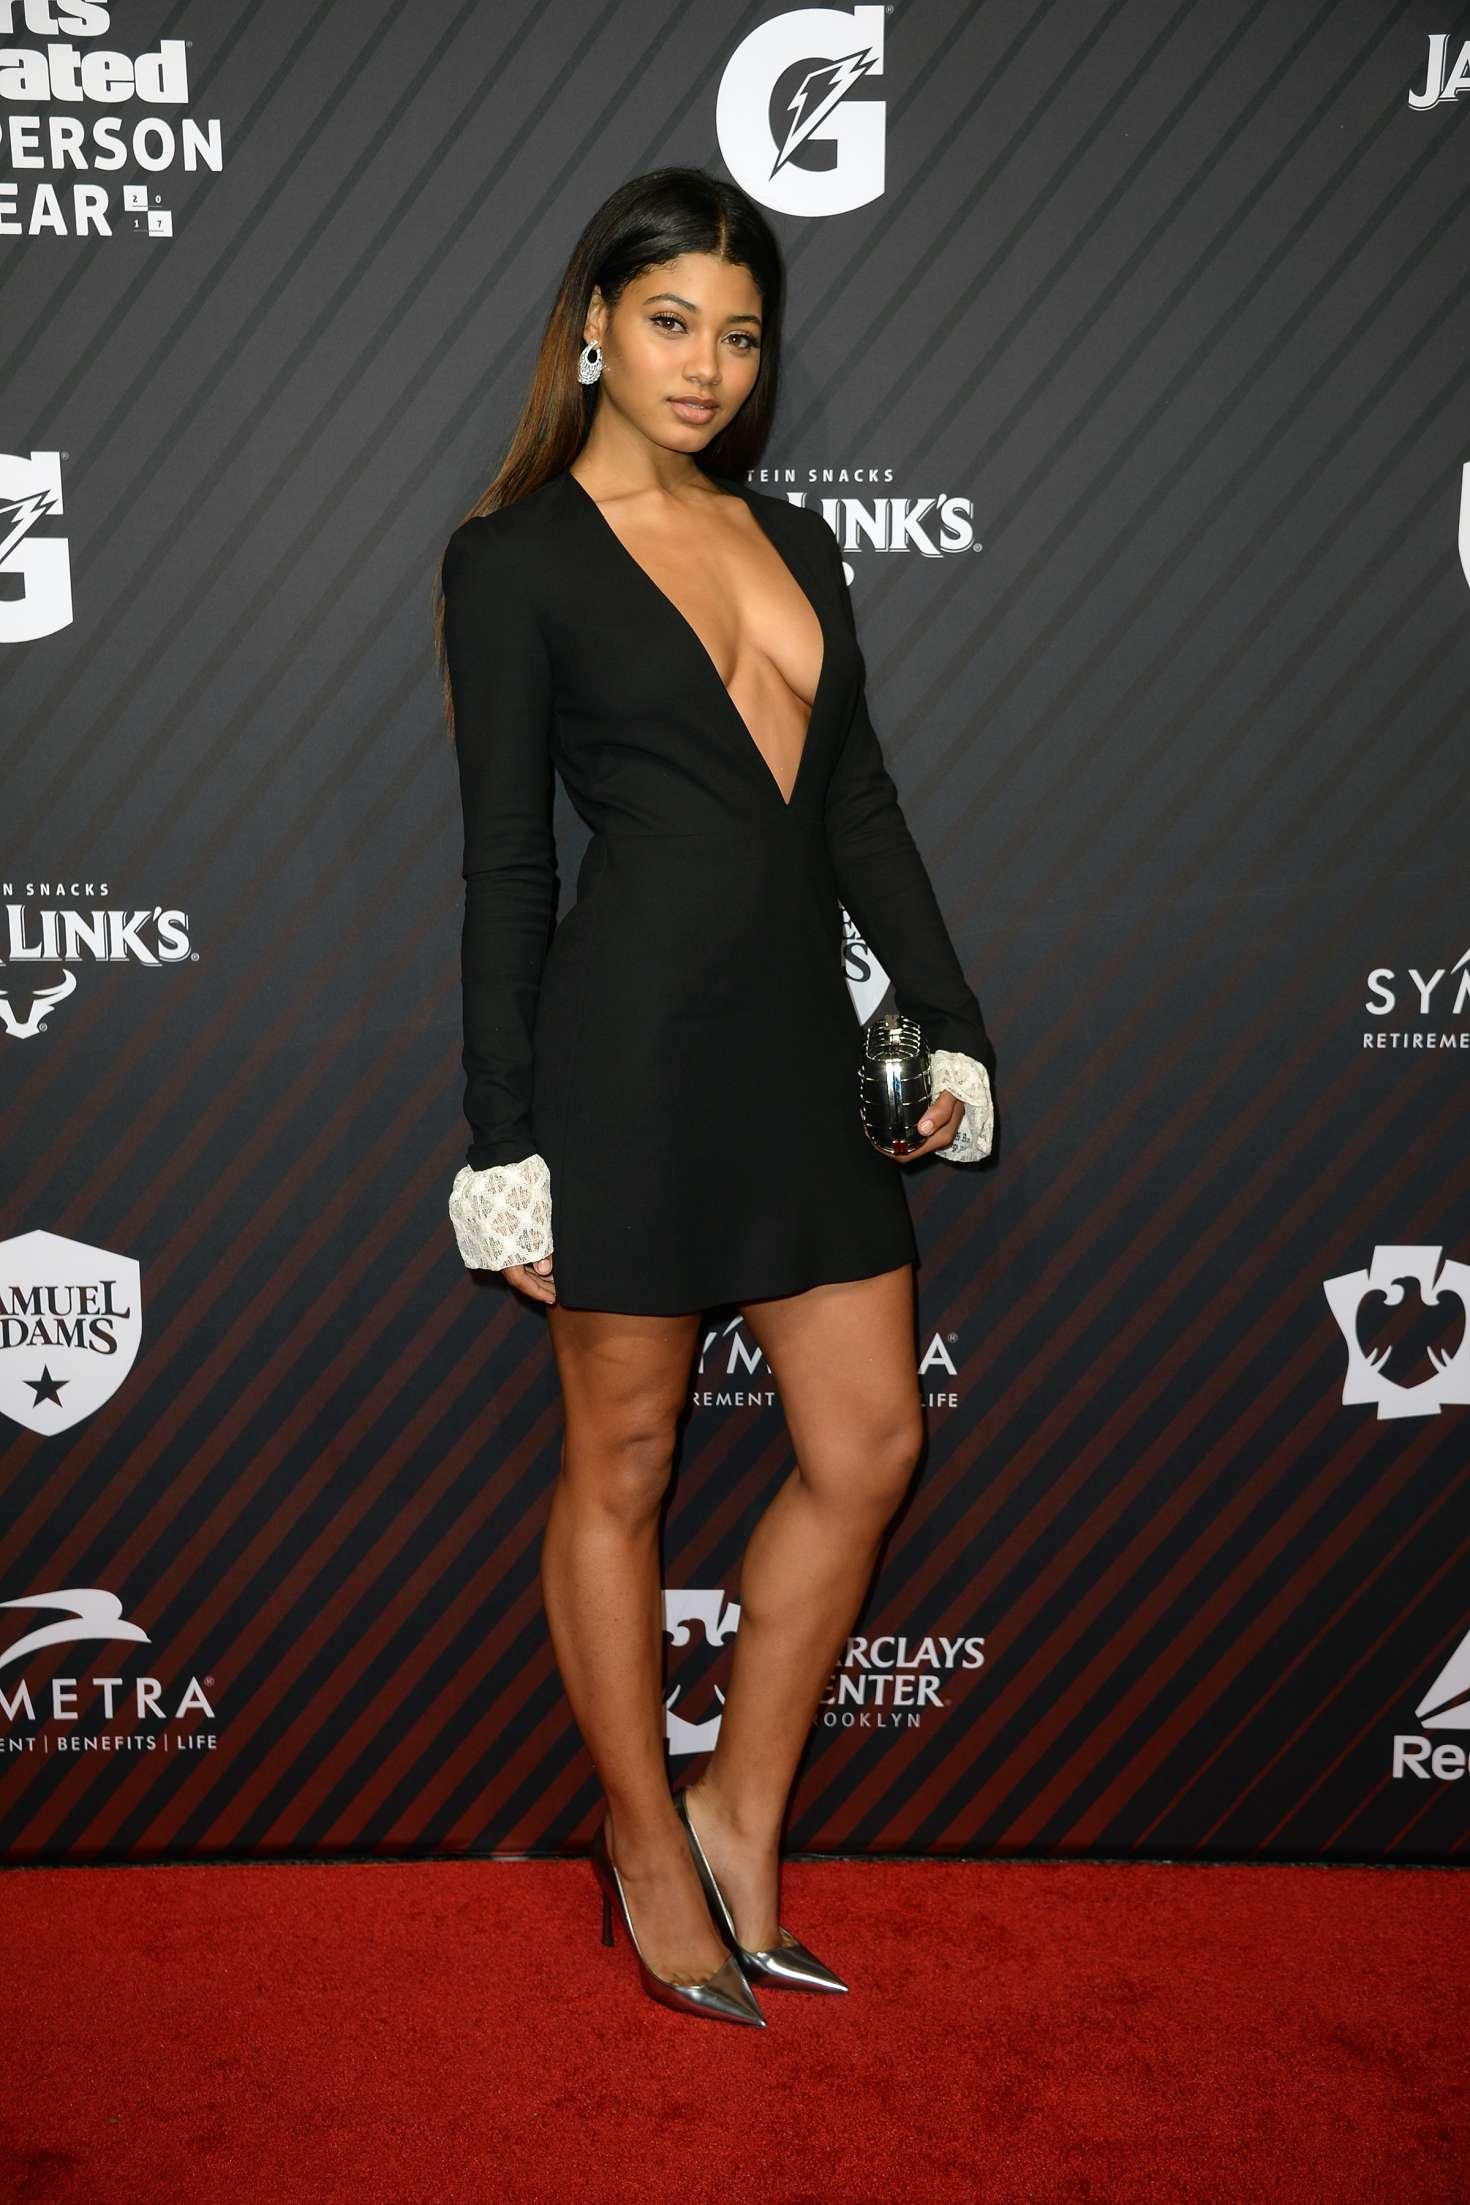 Danielle Herrington 2017 Si Sportsperson Of The Year